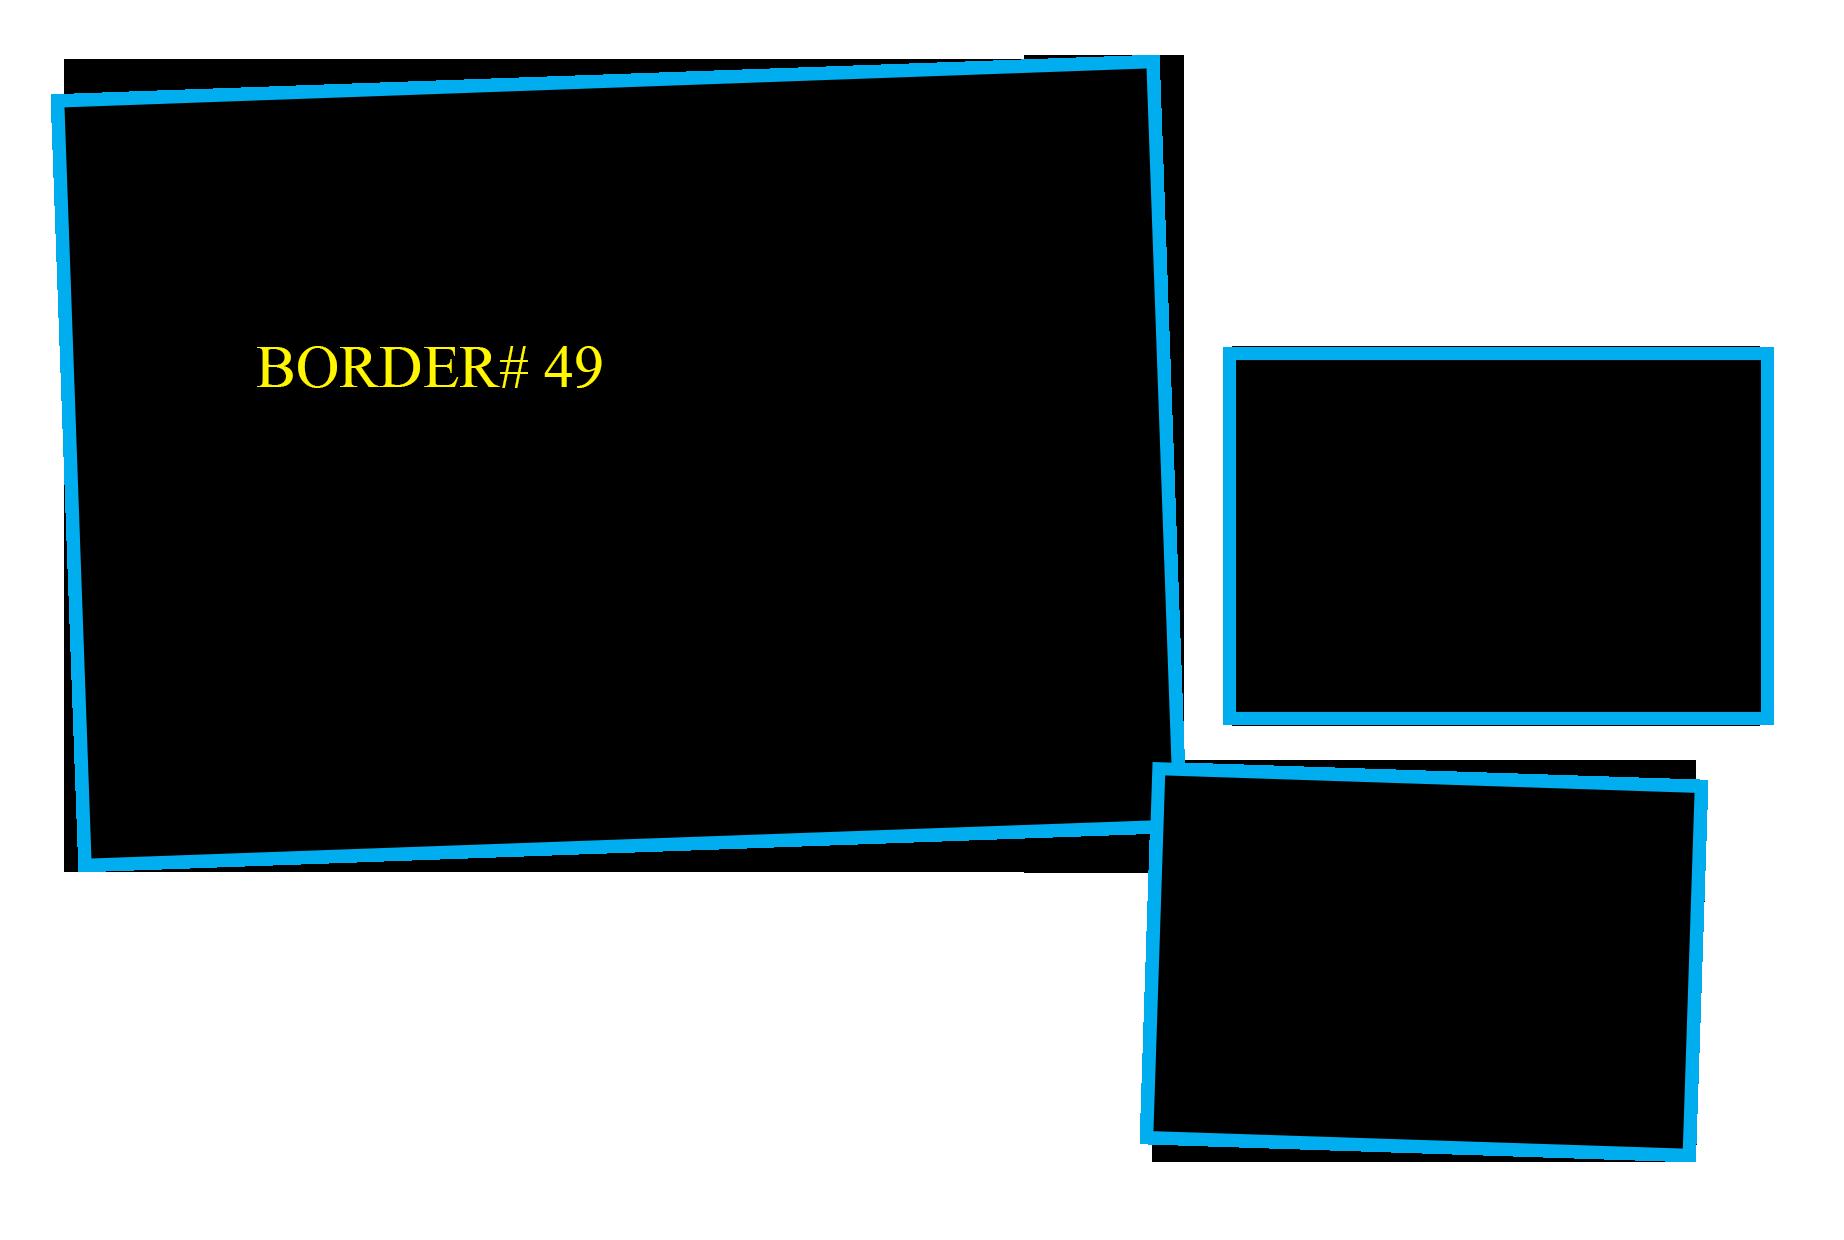 BORDER#49